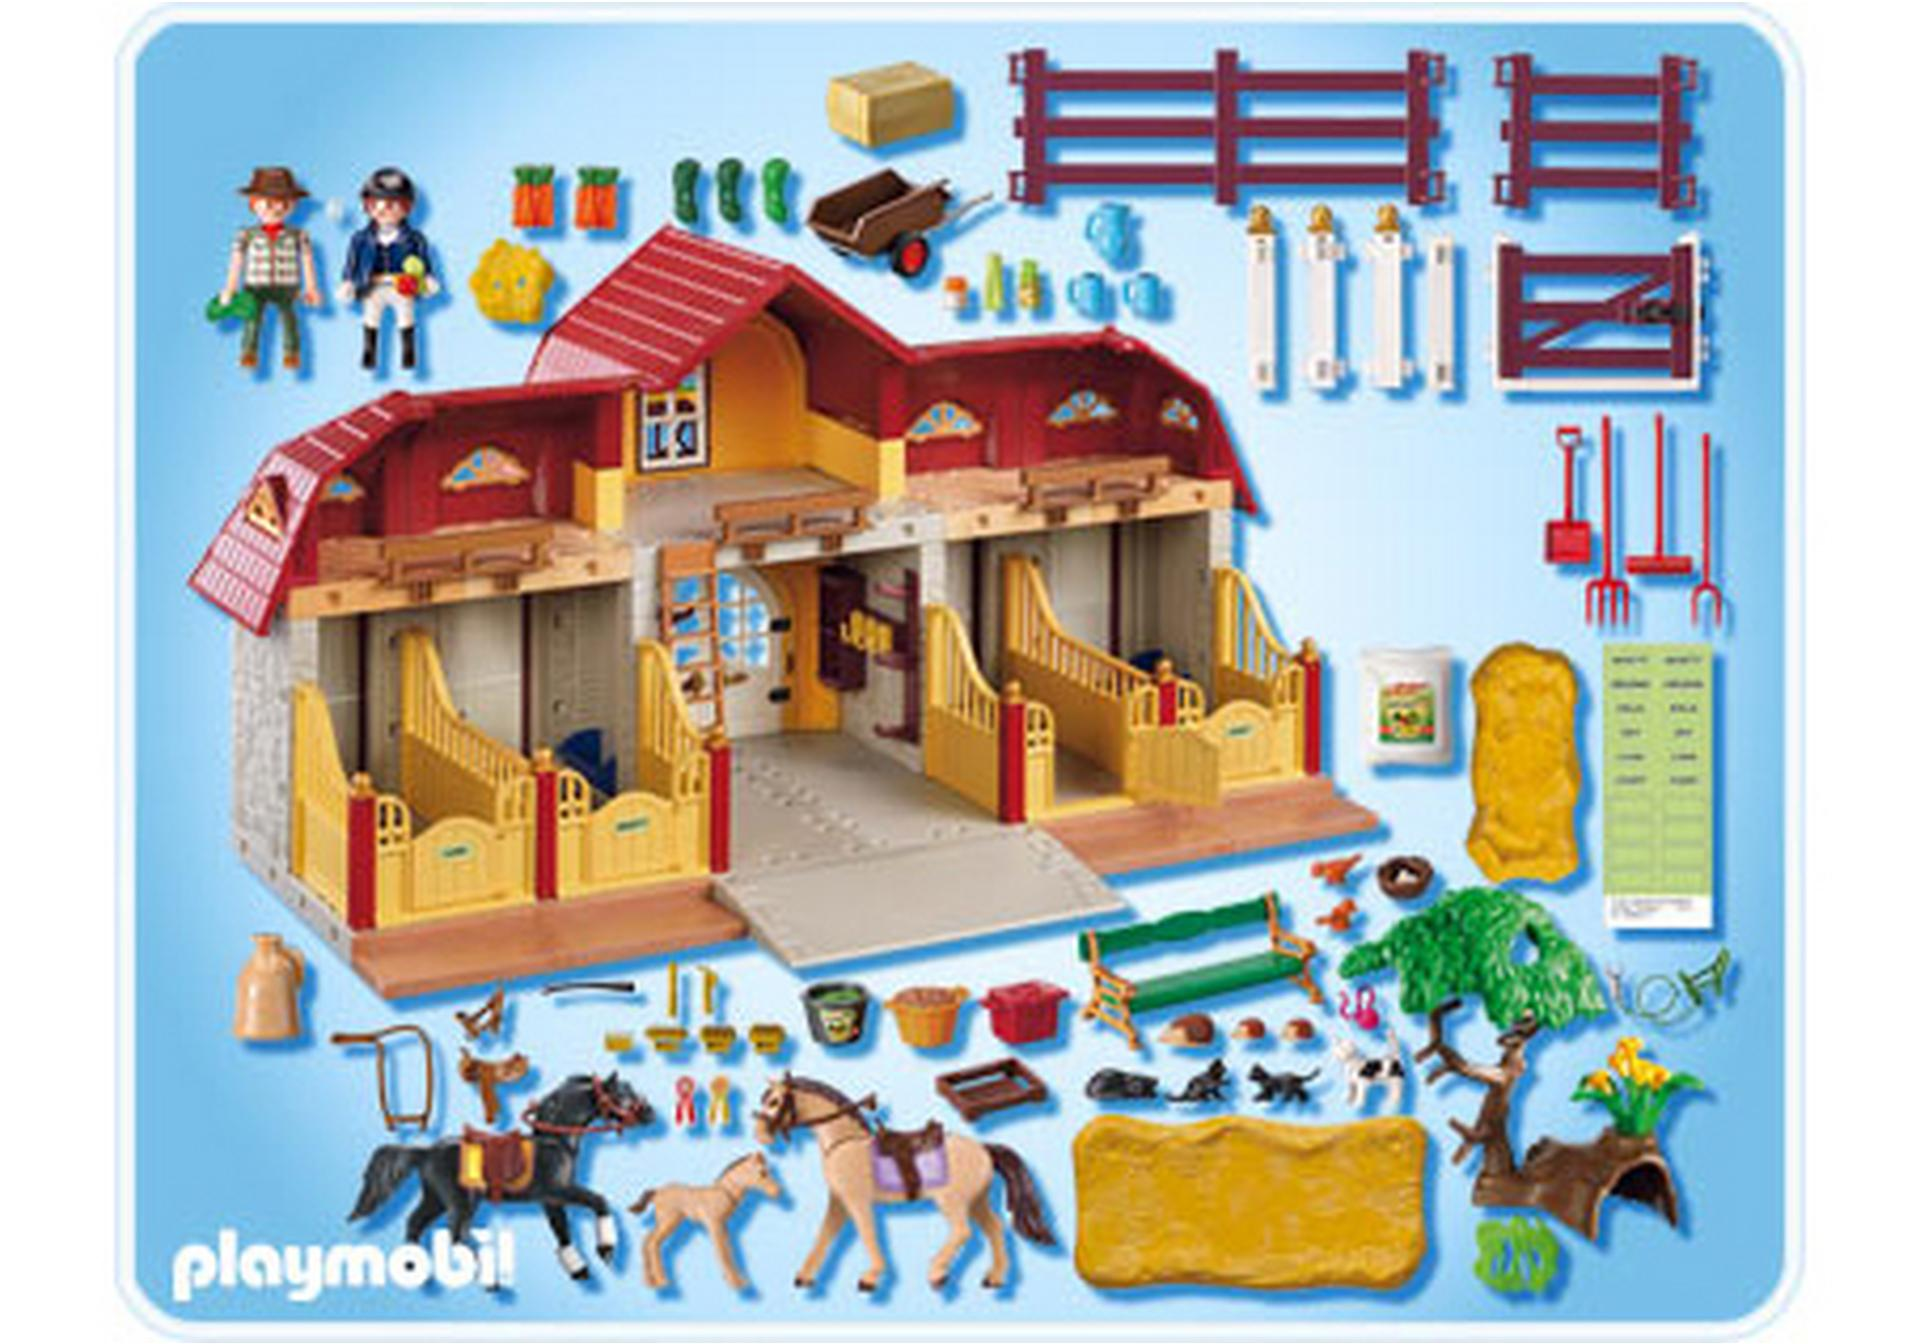 gro er reiterhof mit paddocks 5221 a playmobil. Black Bedroom Furniture Sets. Home Design Ideas